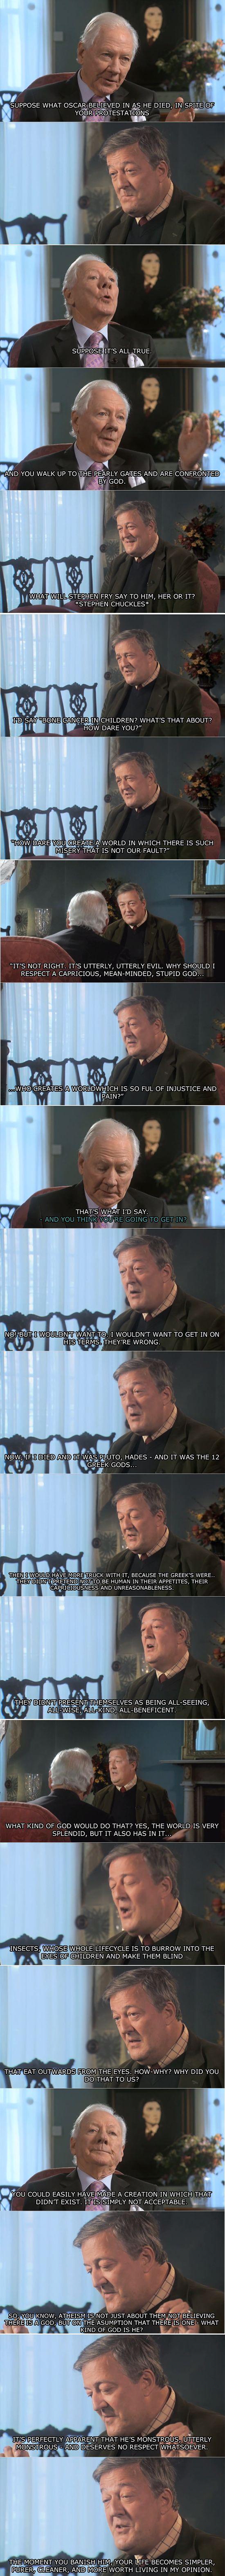 Stephen Fry on God (worth reading)